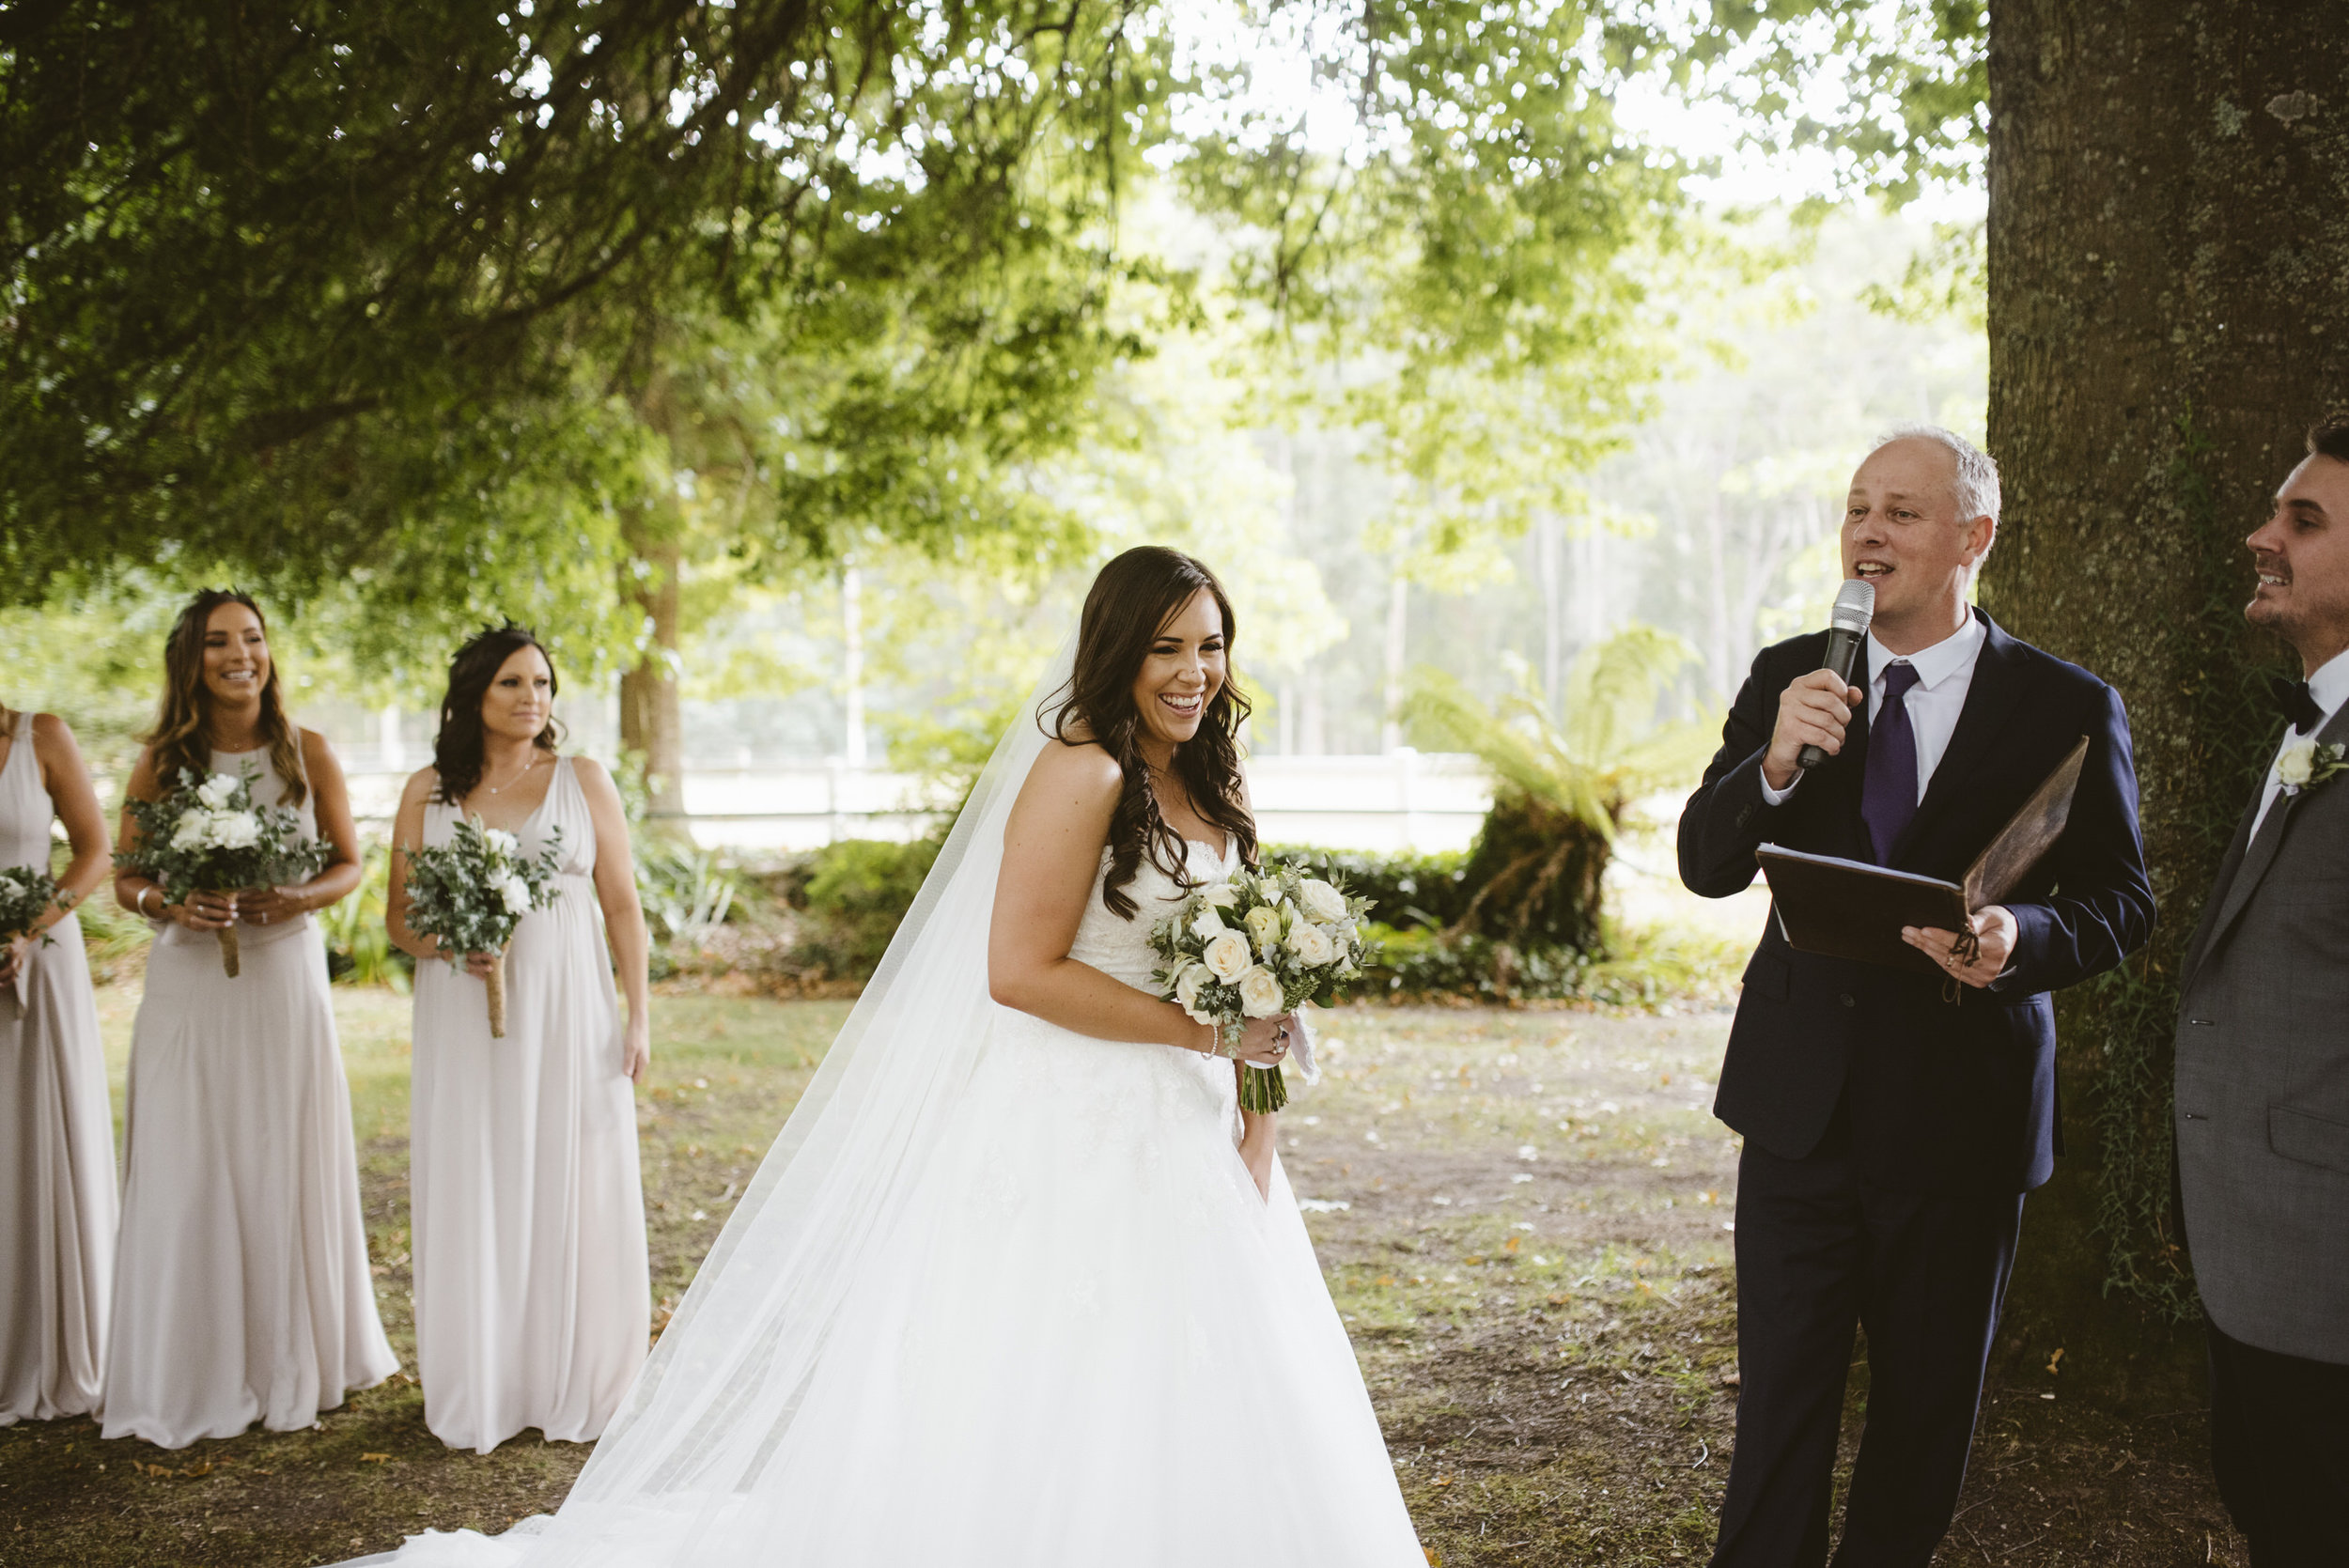 Motta Weddings - Amy and Shane-154.jpg